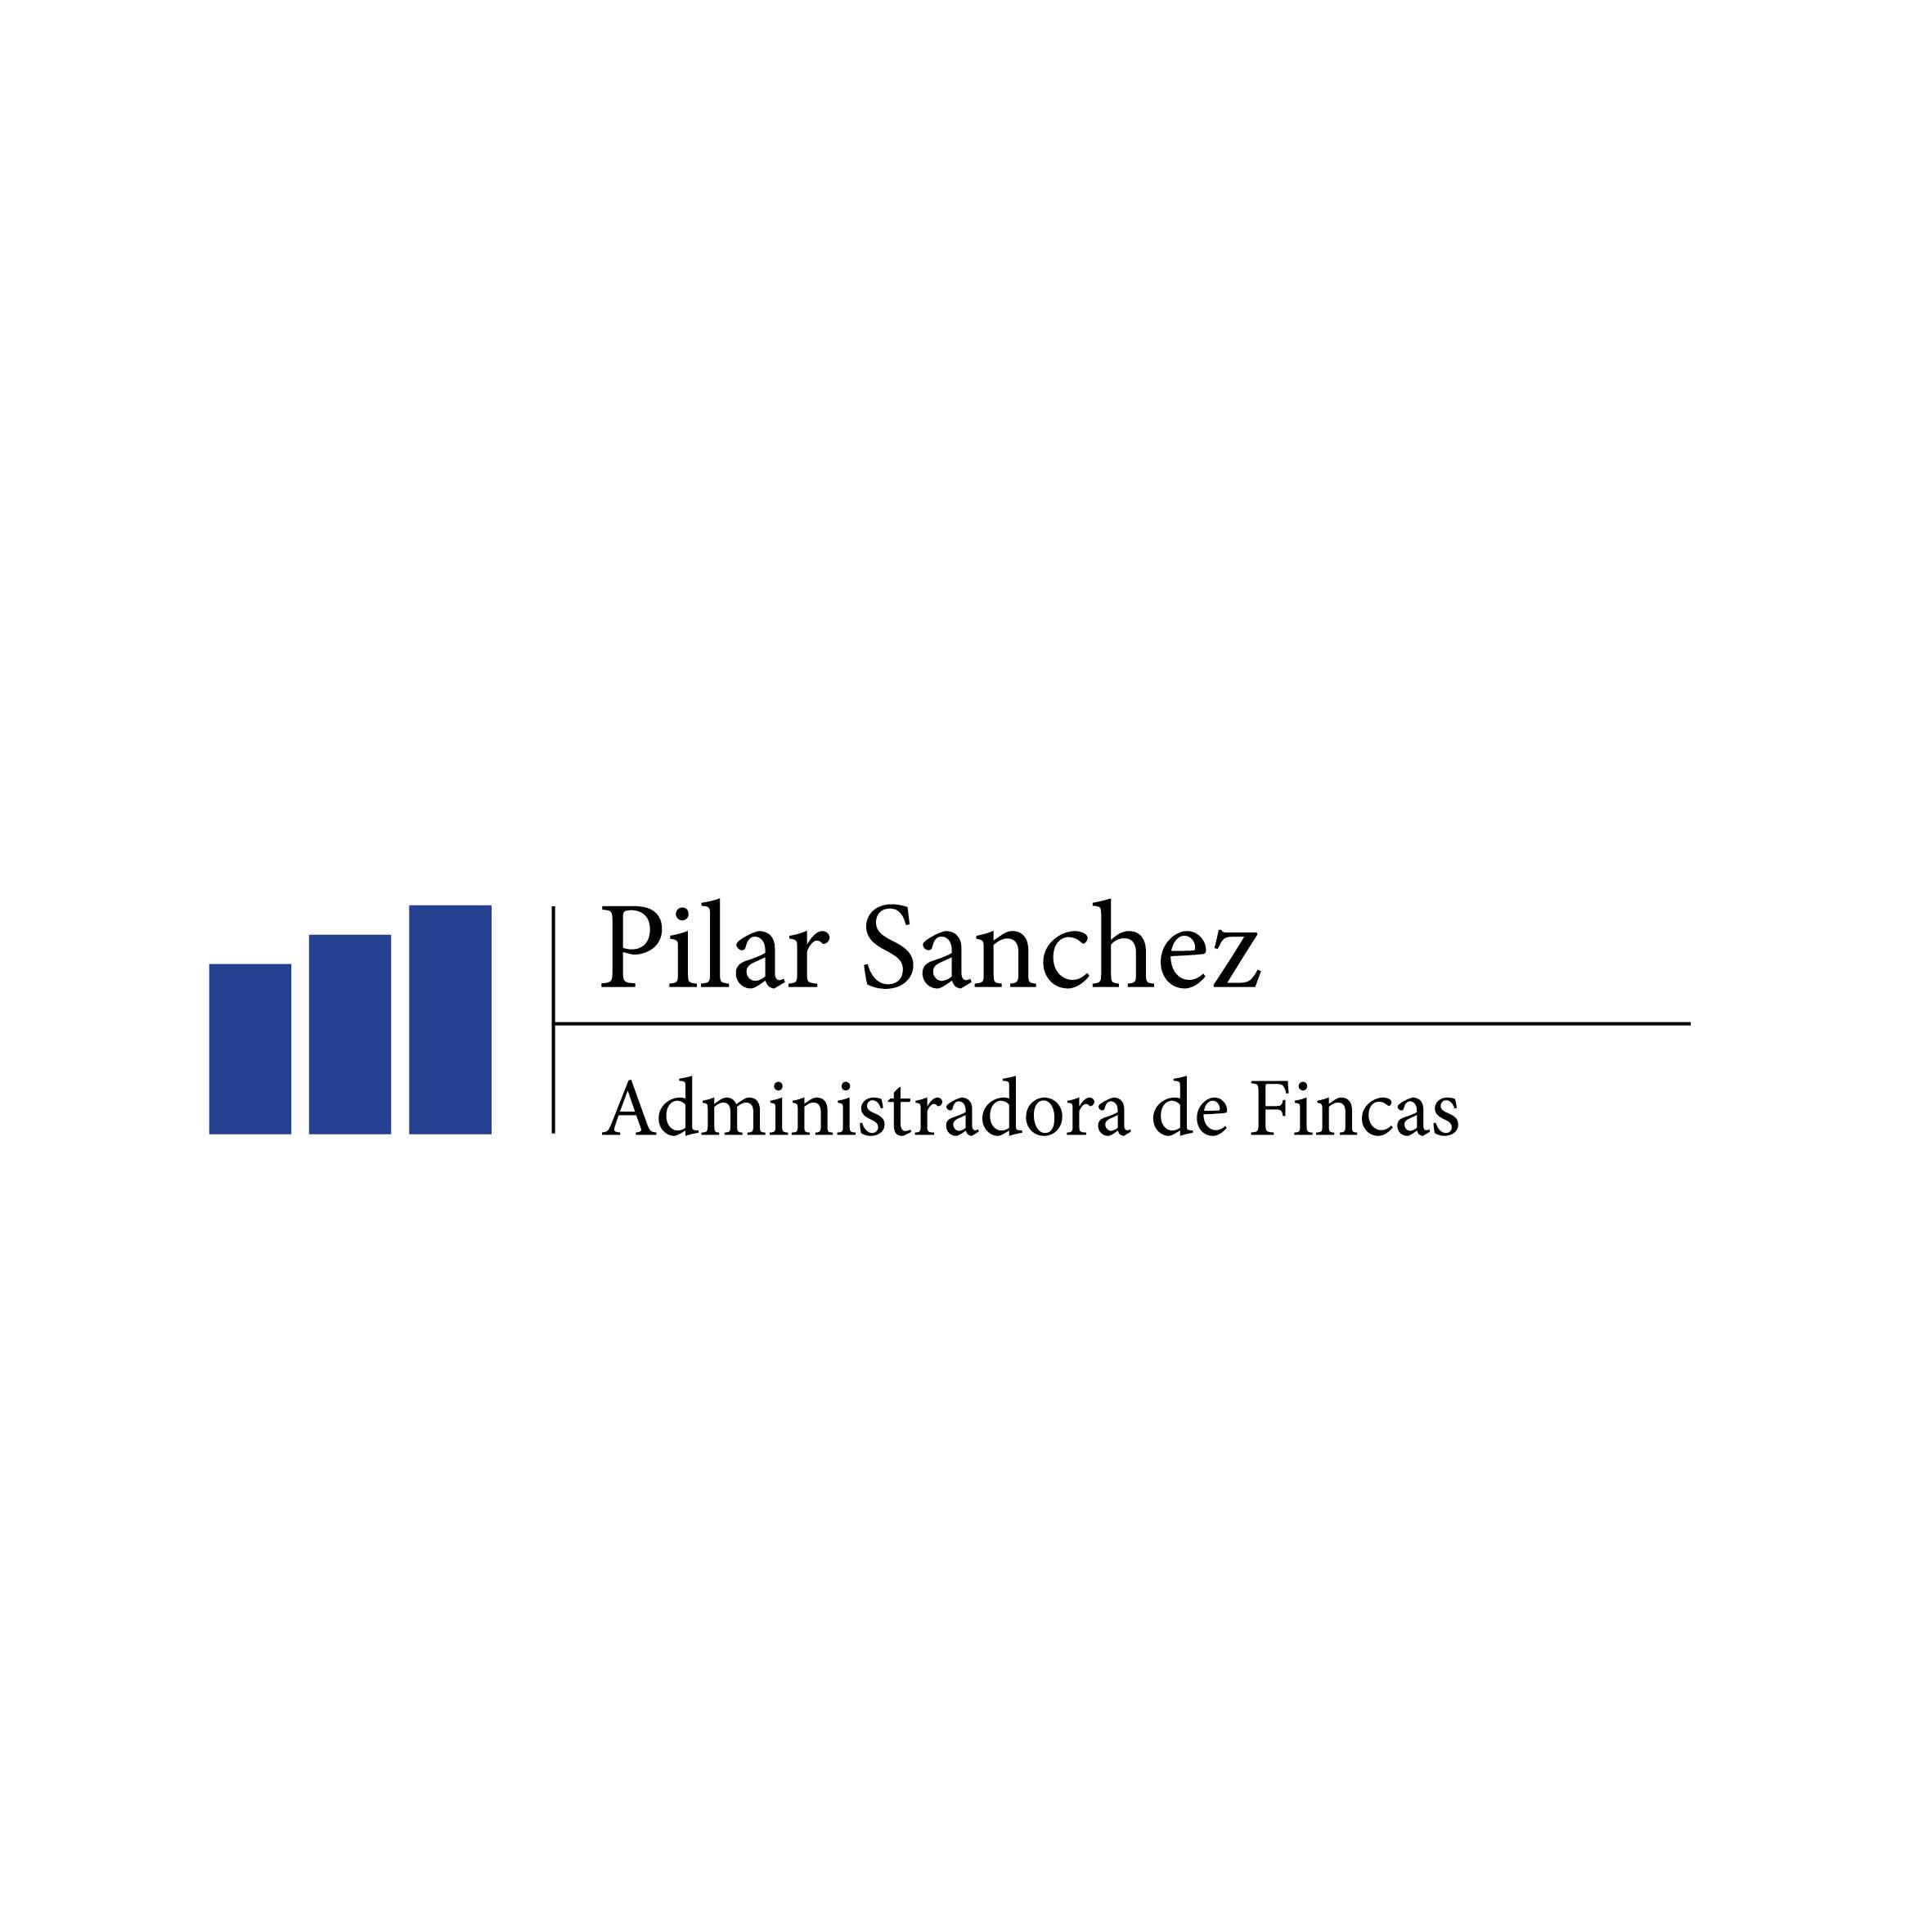 Administradora de fincas.Pilar Sánchez